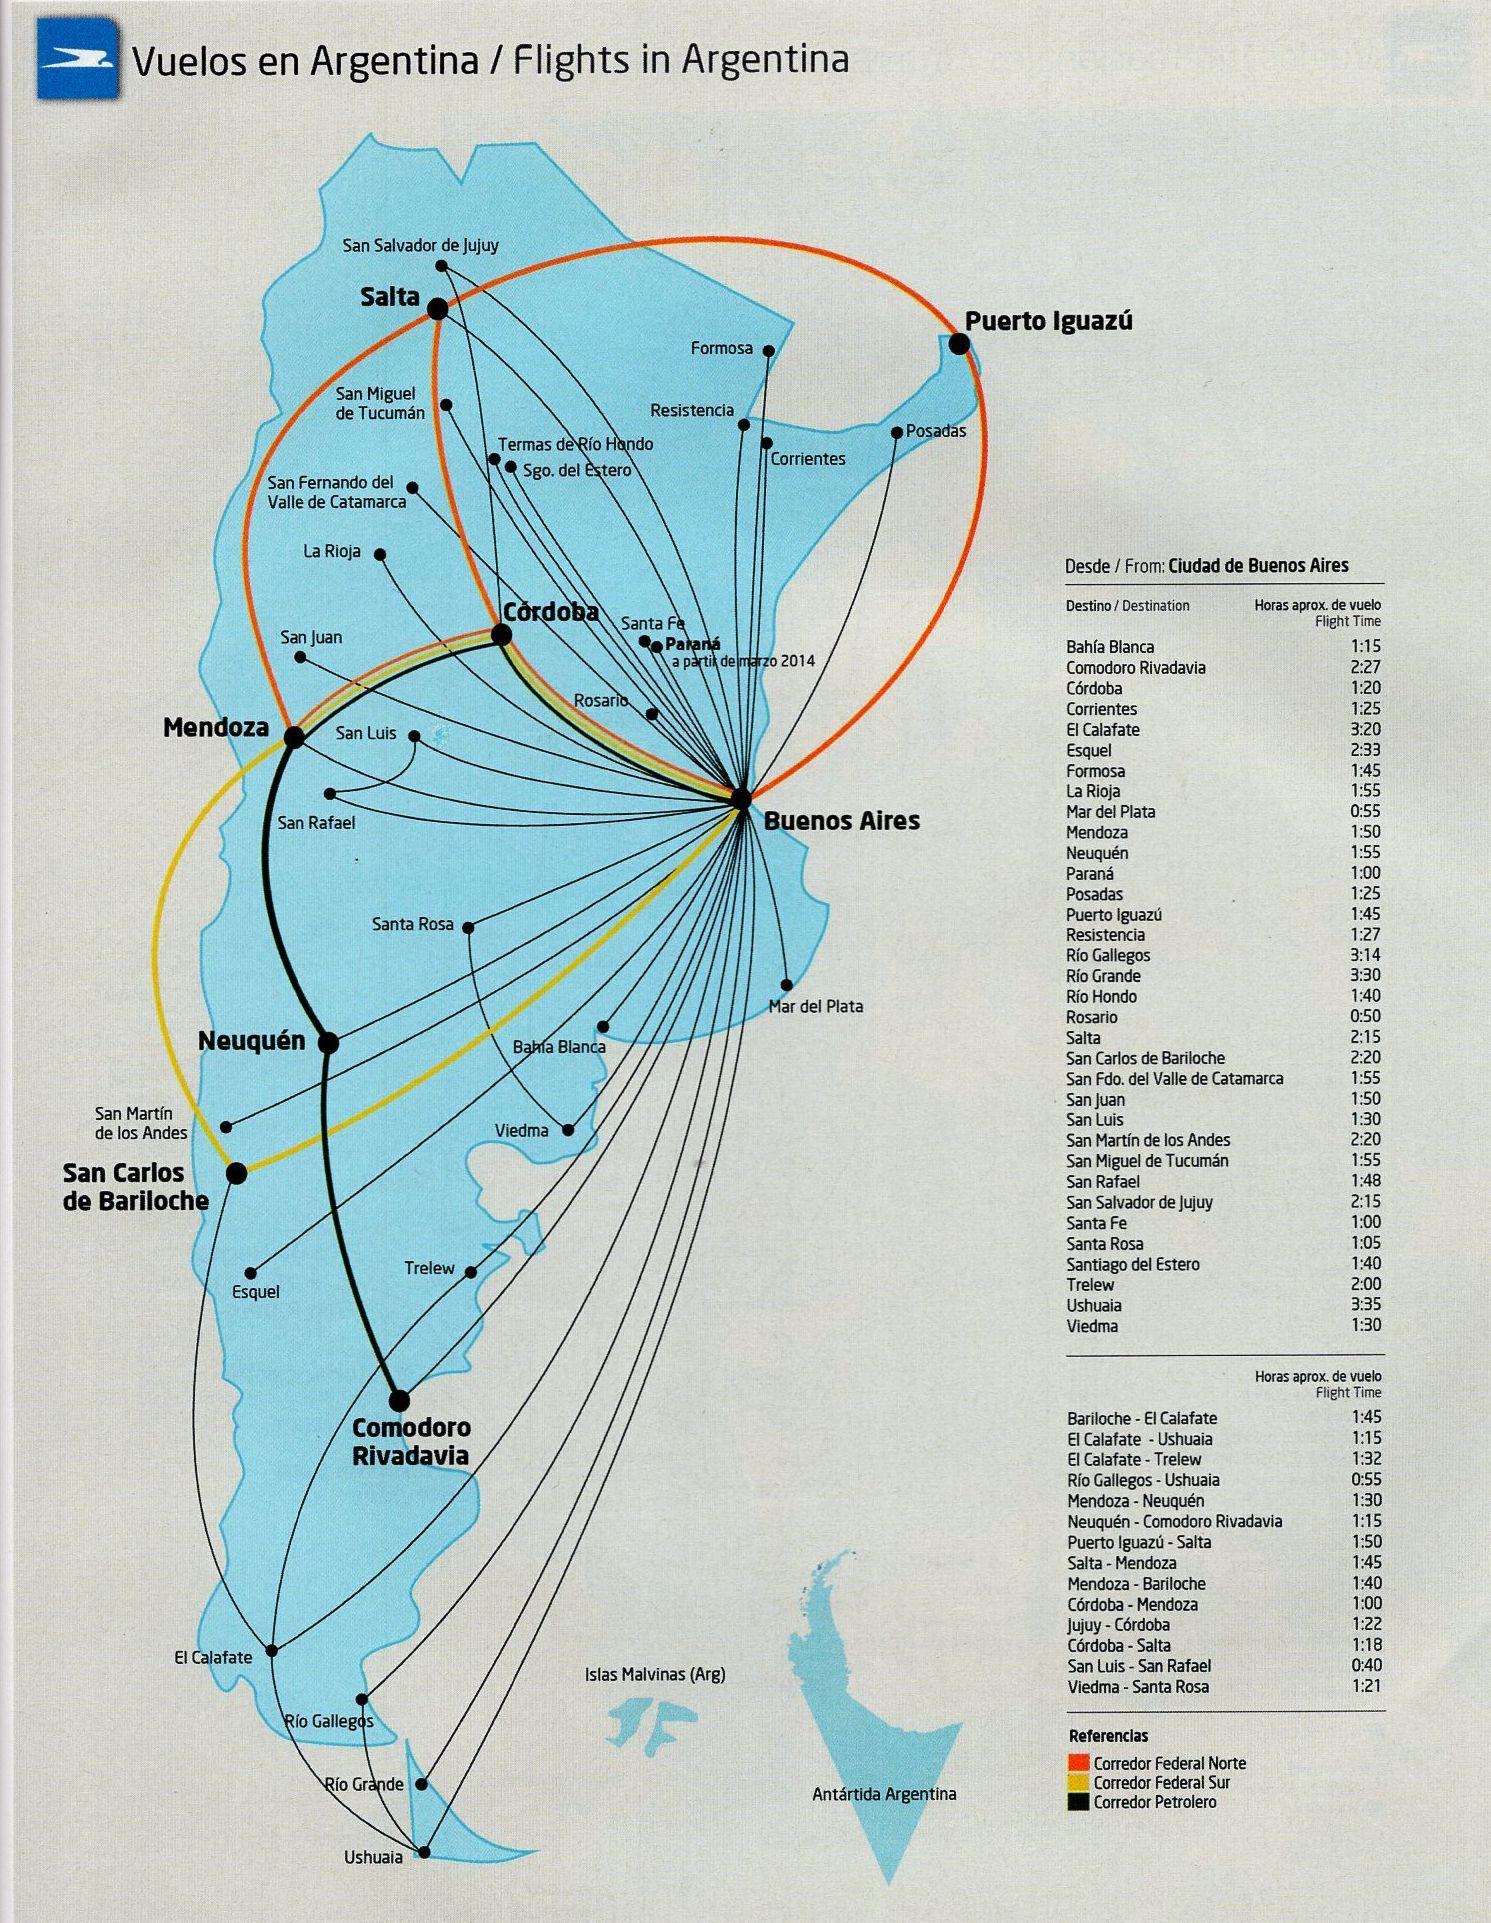 aerolineas argentinas route map Aerolineas Argentinas Domestic Routemap 2013 Route Map Map aerolineas argentinas route map